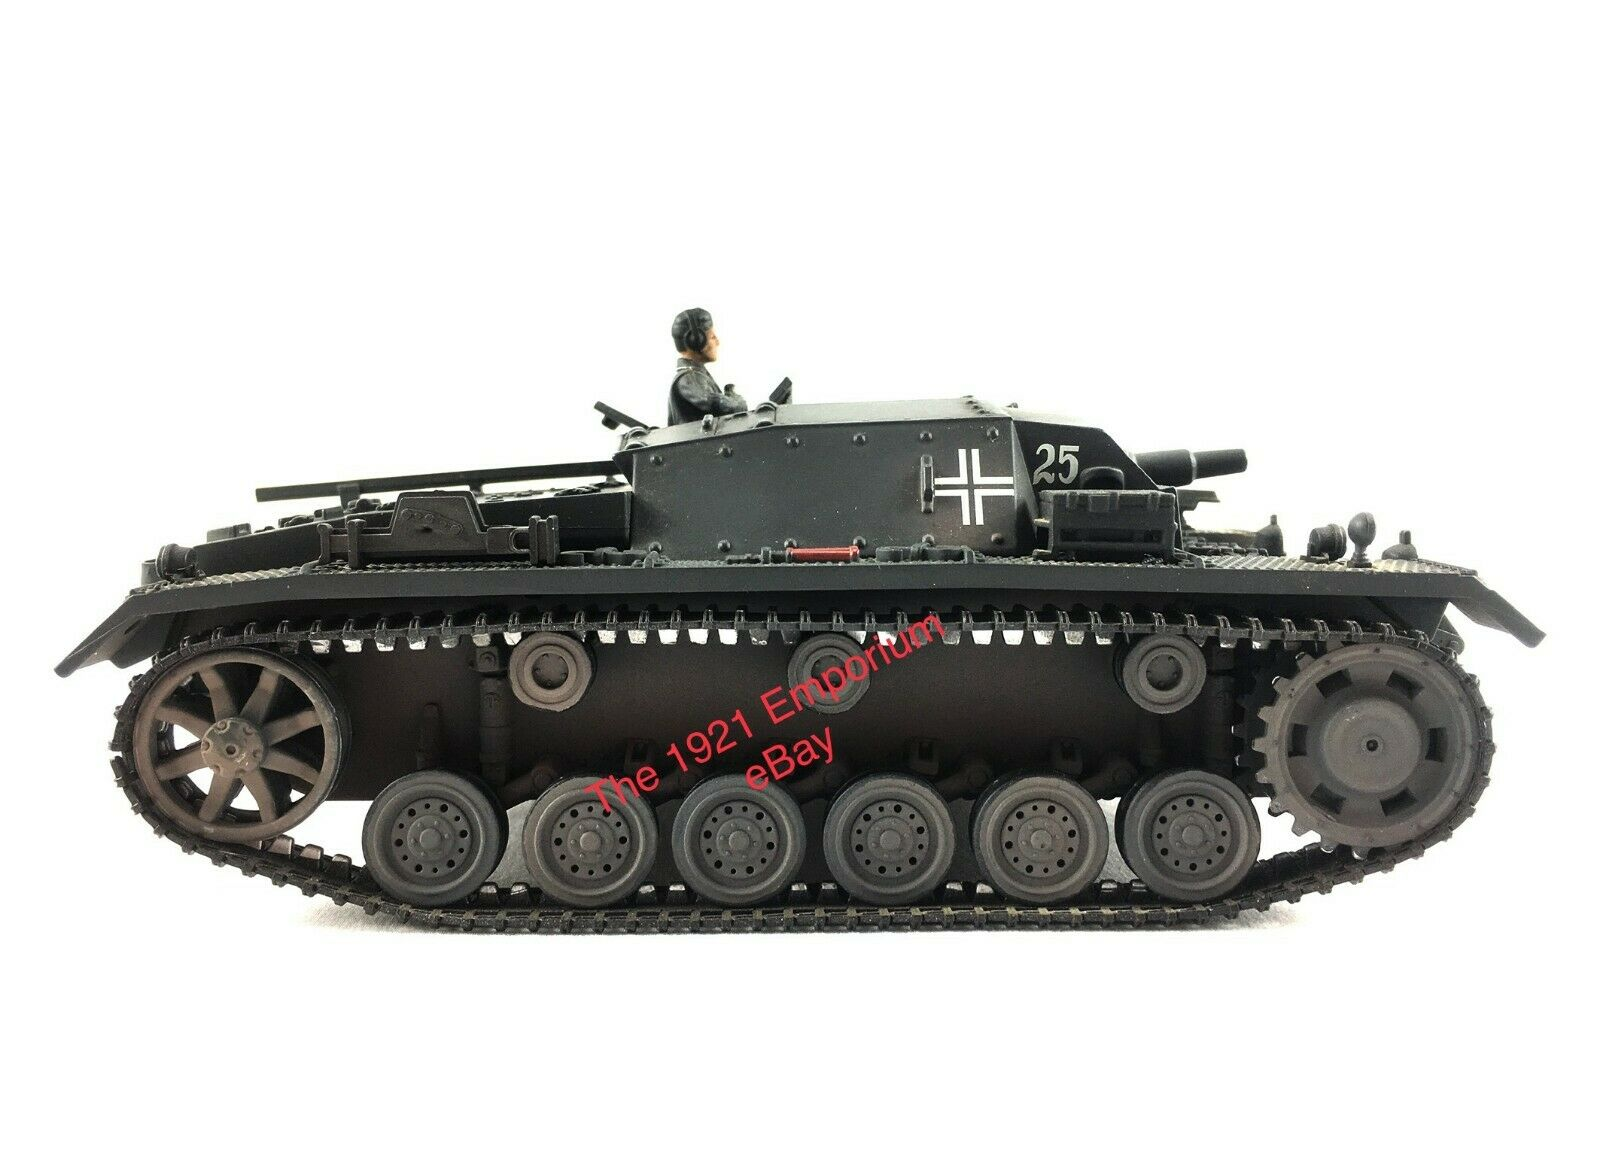 1 32 Diecast Unimax Spielzeugs Forces of Valor WWII German Sturmgeschutz Tank StuG A B